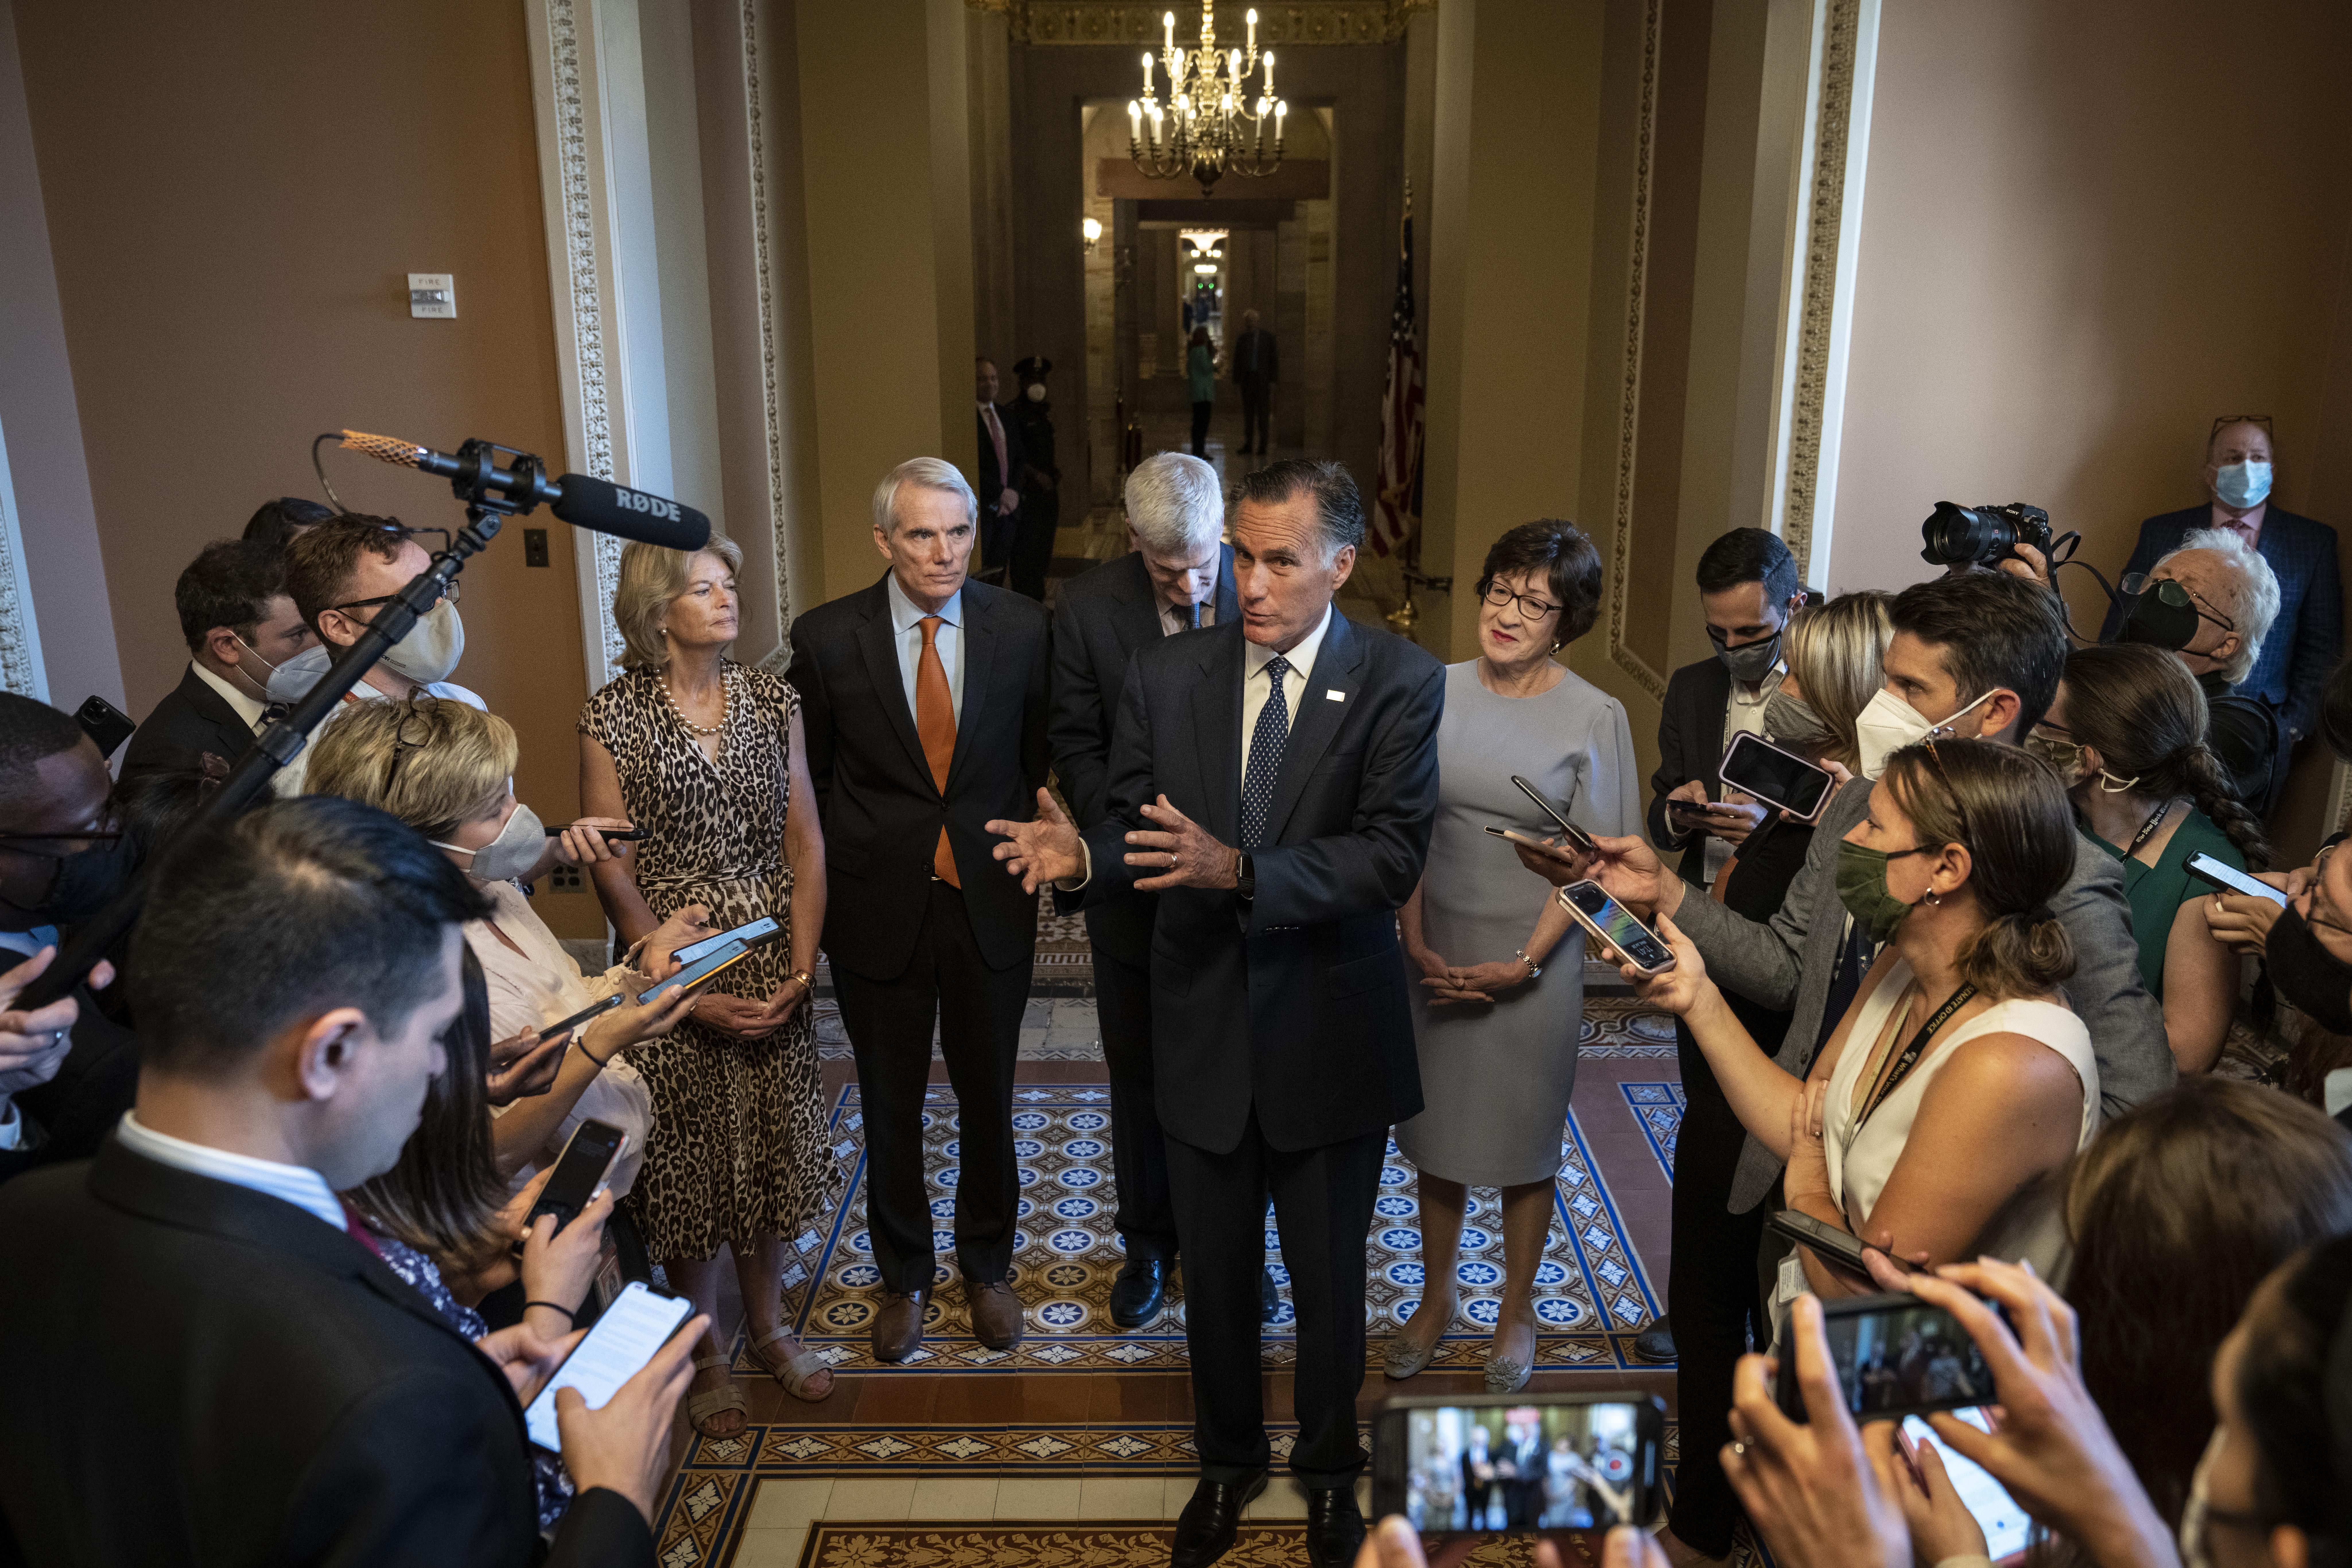 The lead GOP negotiators – Sens. Lisa Murkowski, Rob Portman, Bill Cassidy, Mitt Romney and Susan Collins speak at the Capitol on Wednesday. (Drew Angerer/Getty Images)